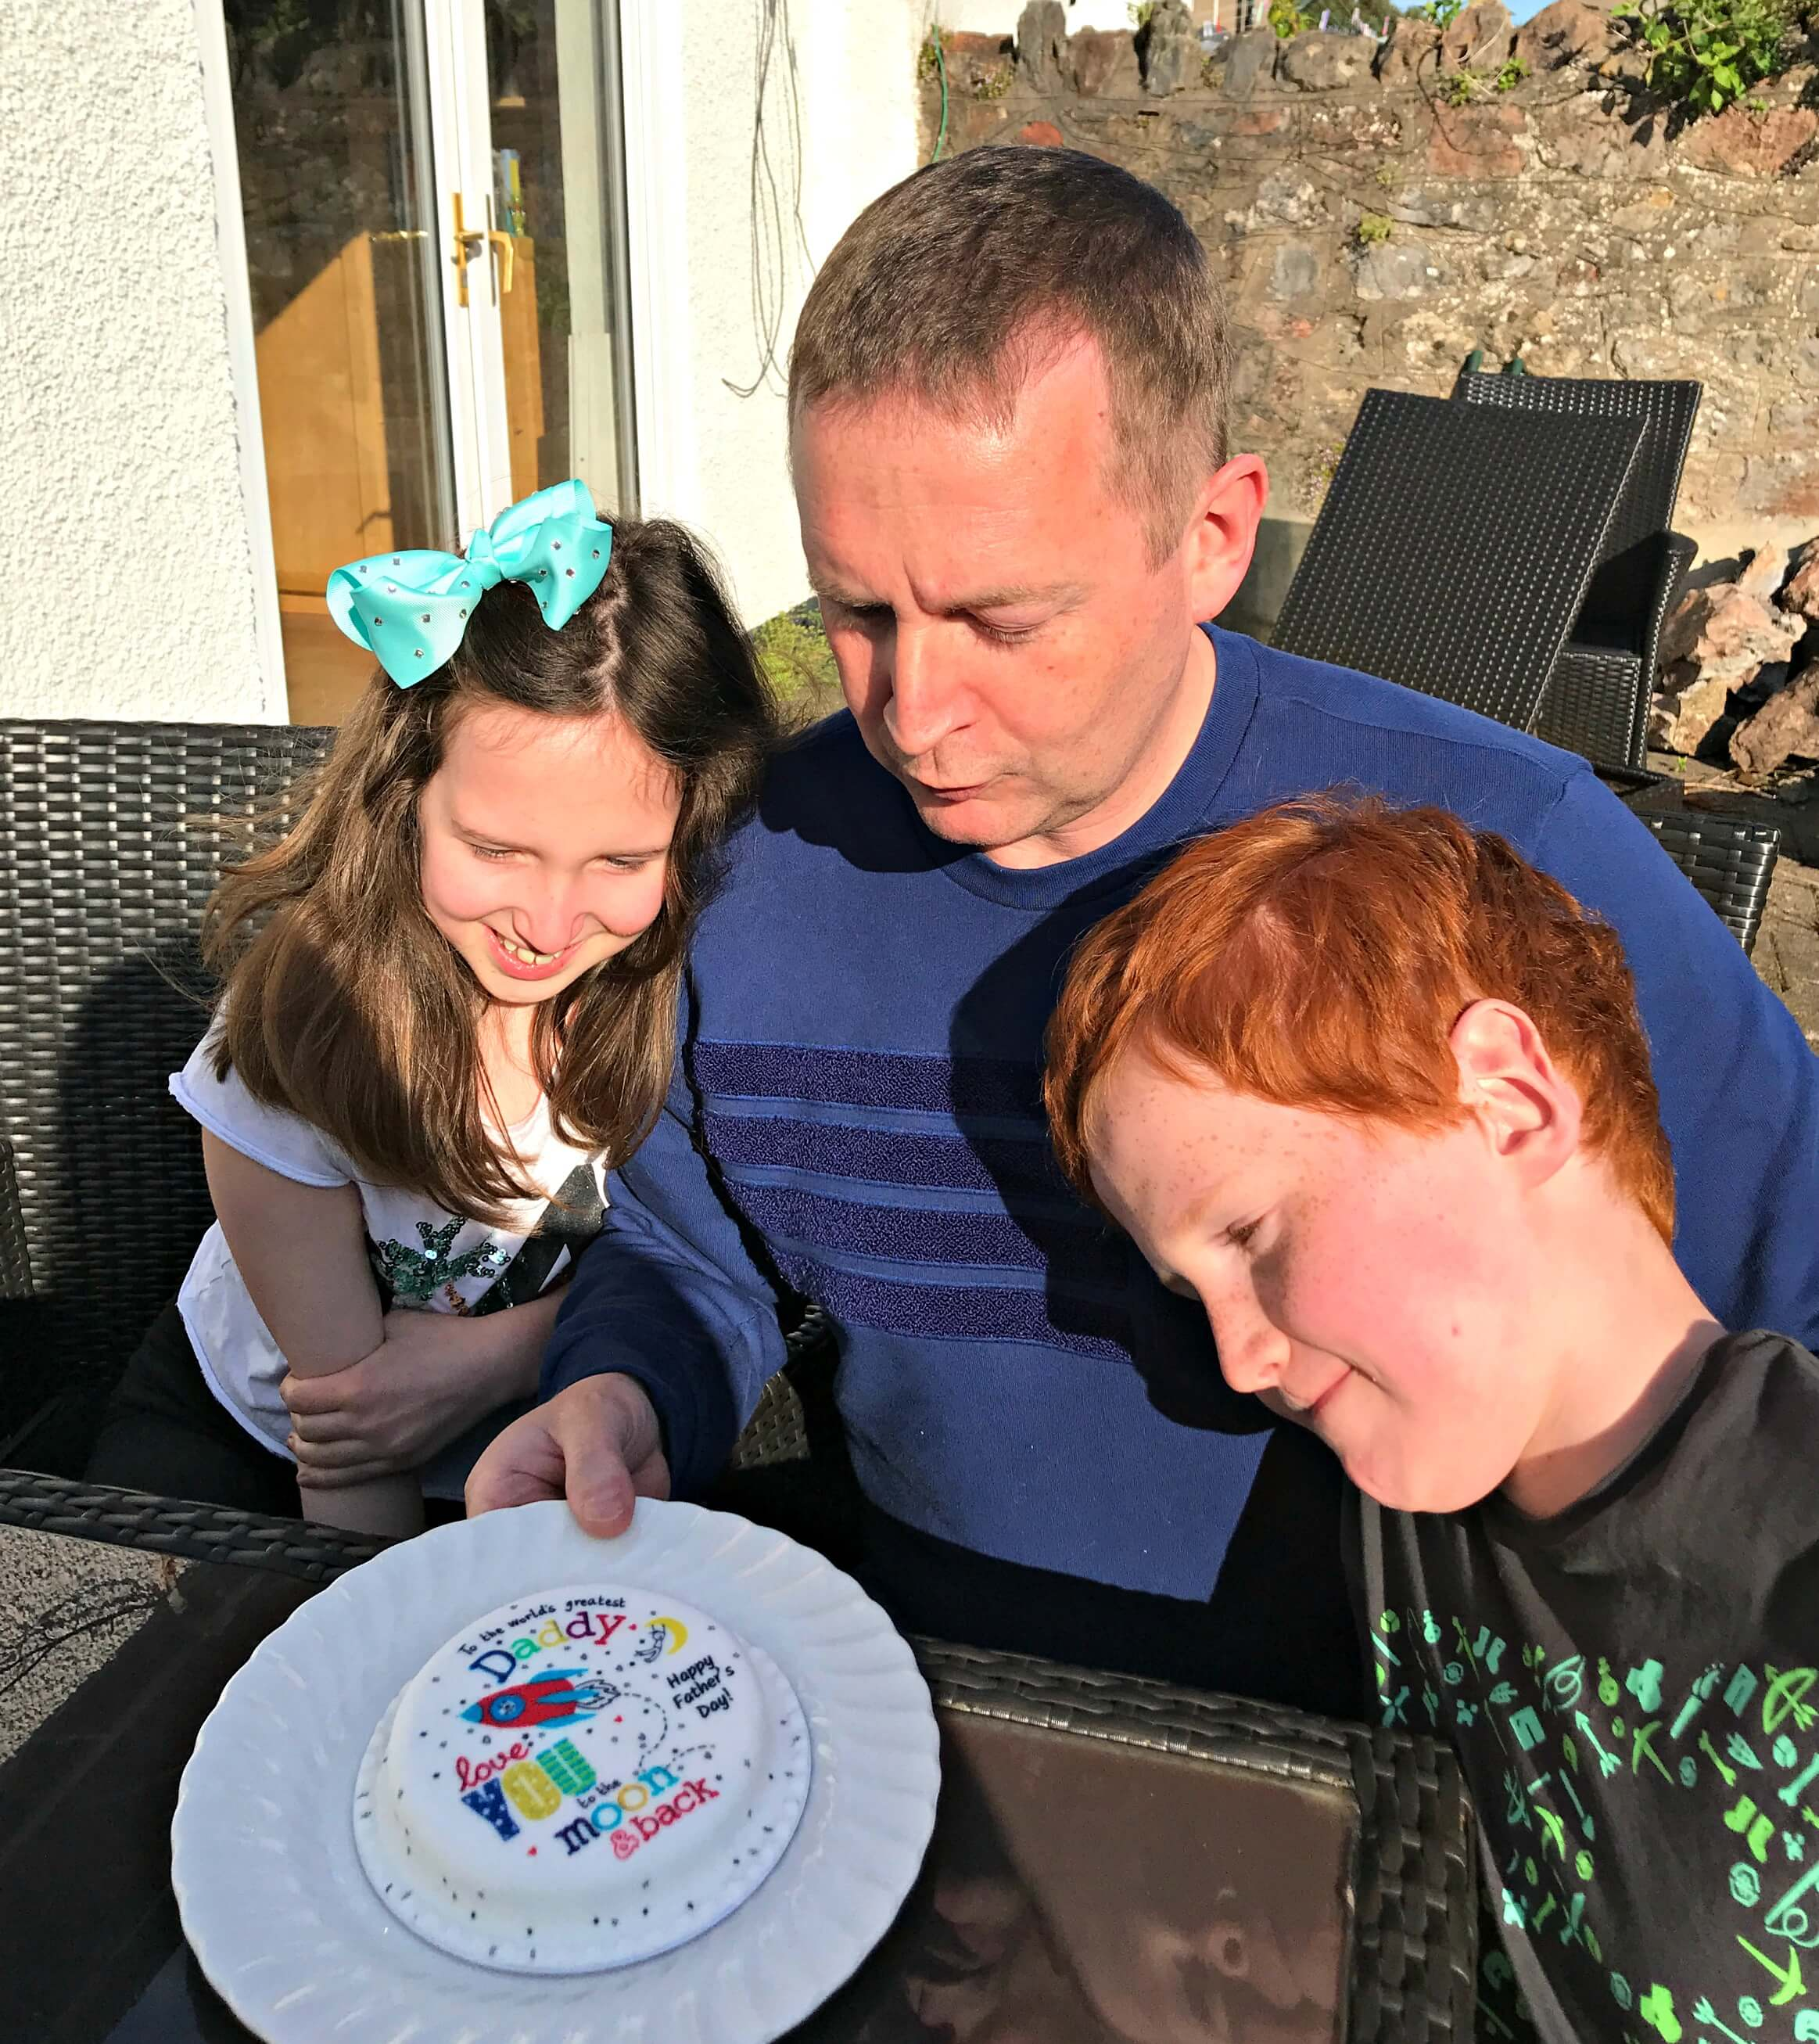 Bakerdays Cakes - Mat, Caitlin and Ieuan with the Father's Day cake